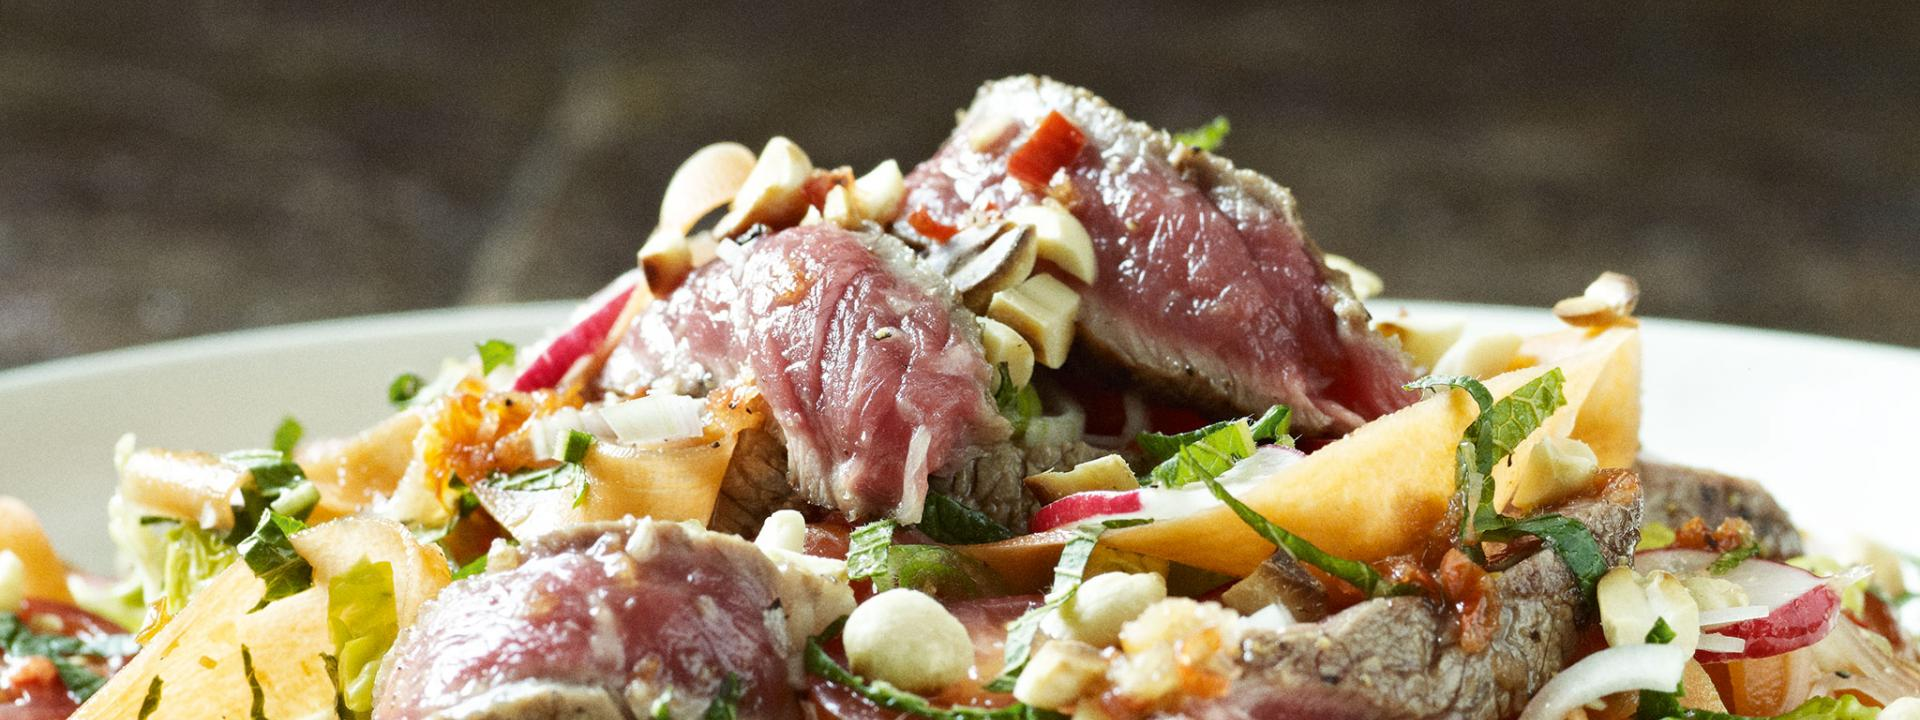 Spicey Beef Salad 368 3